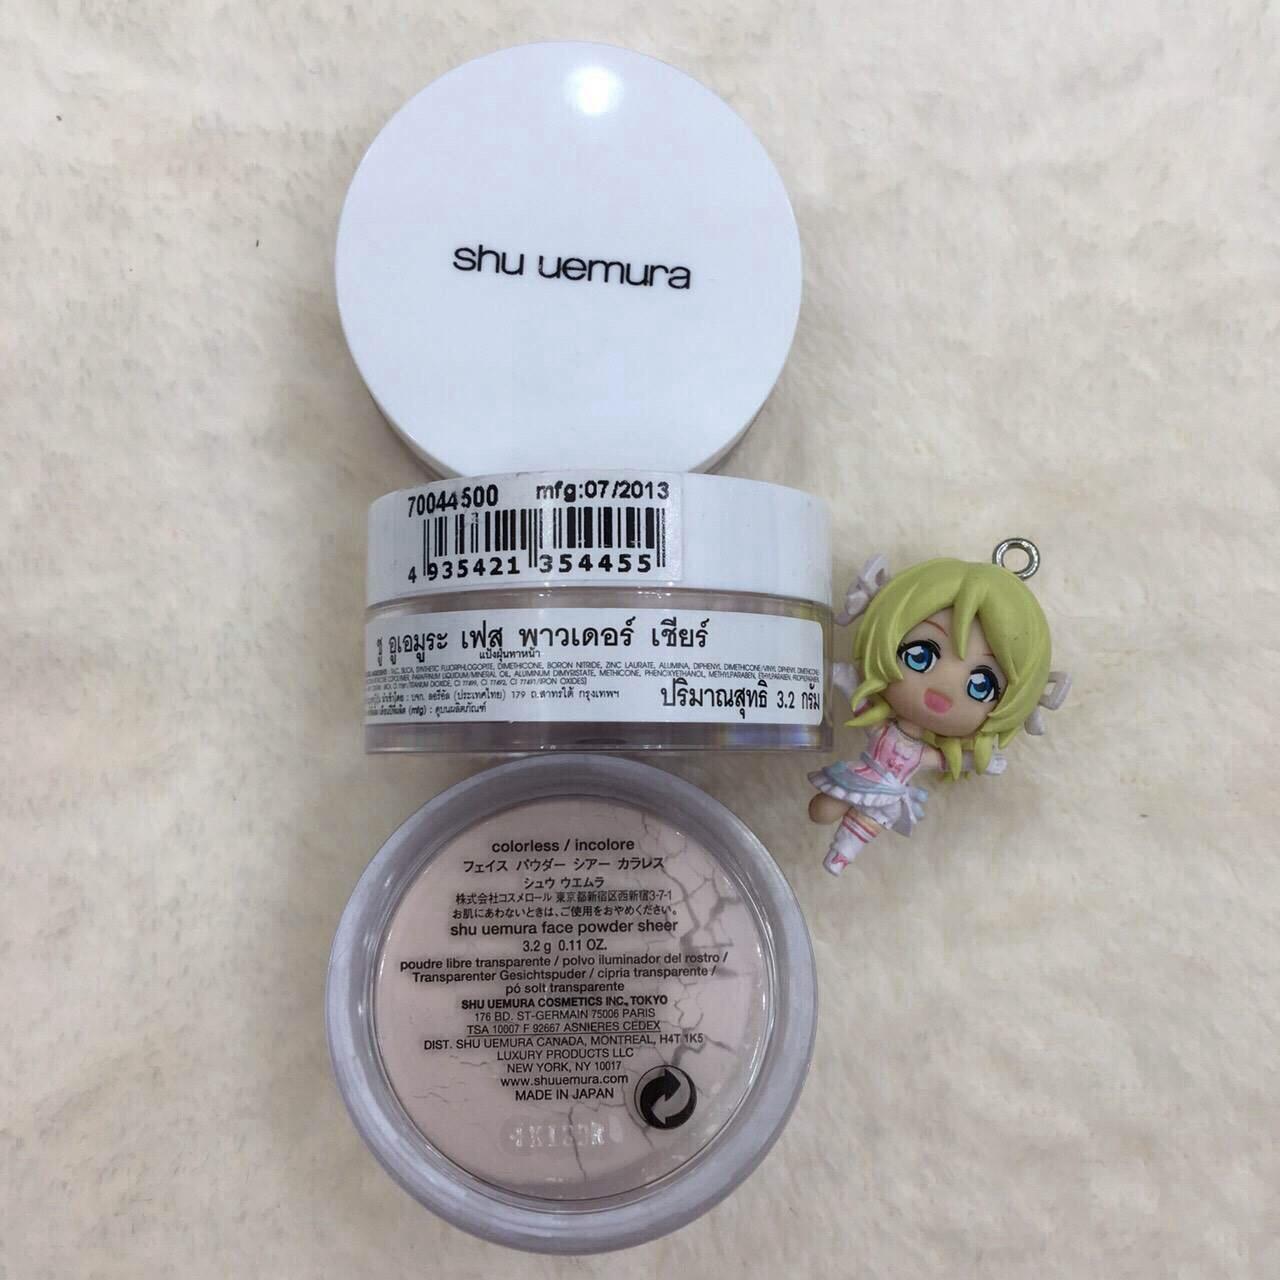 #Shu Uemura Face Powder Sheer